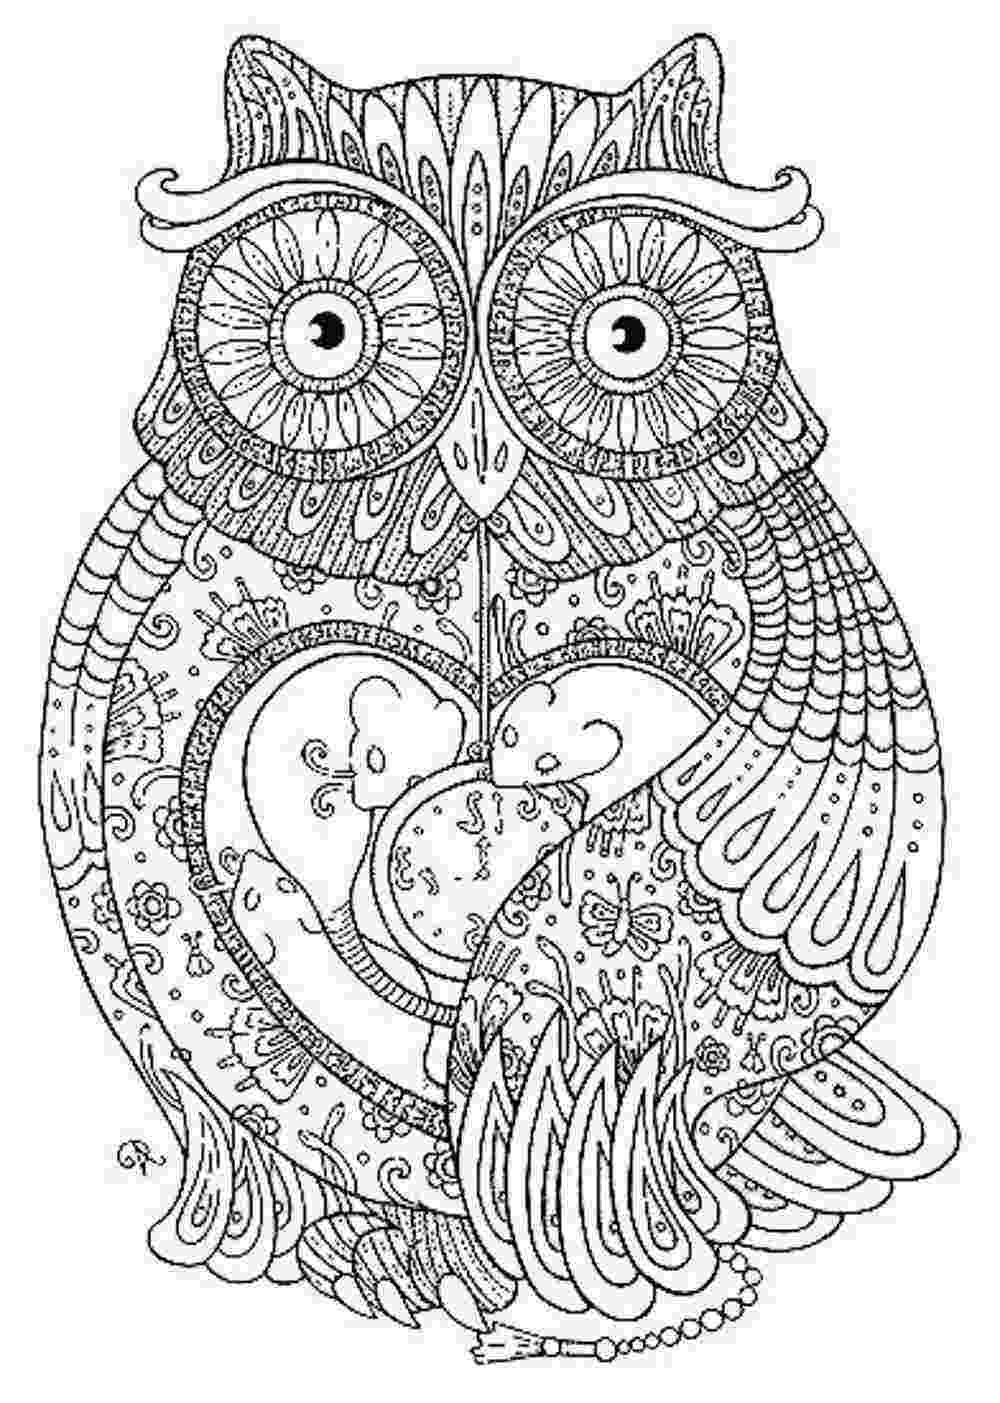 printable mandala coloring pages for adults mindful mandalas juste etre just be adults mandala for printable coloring pages